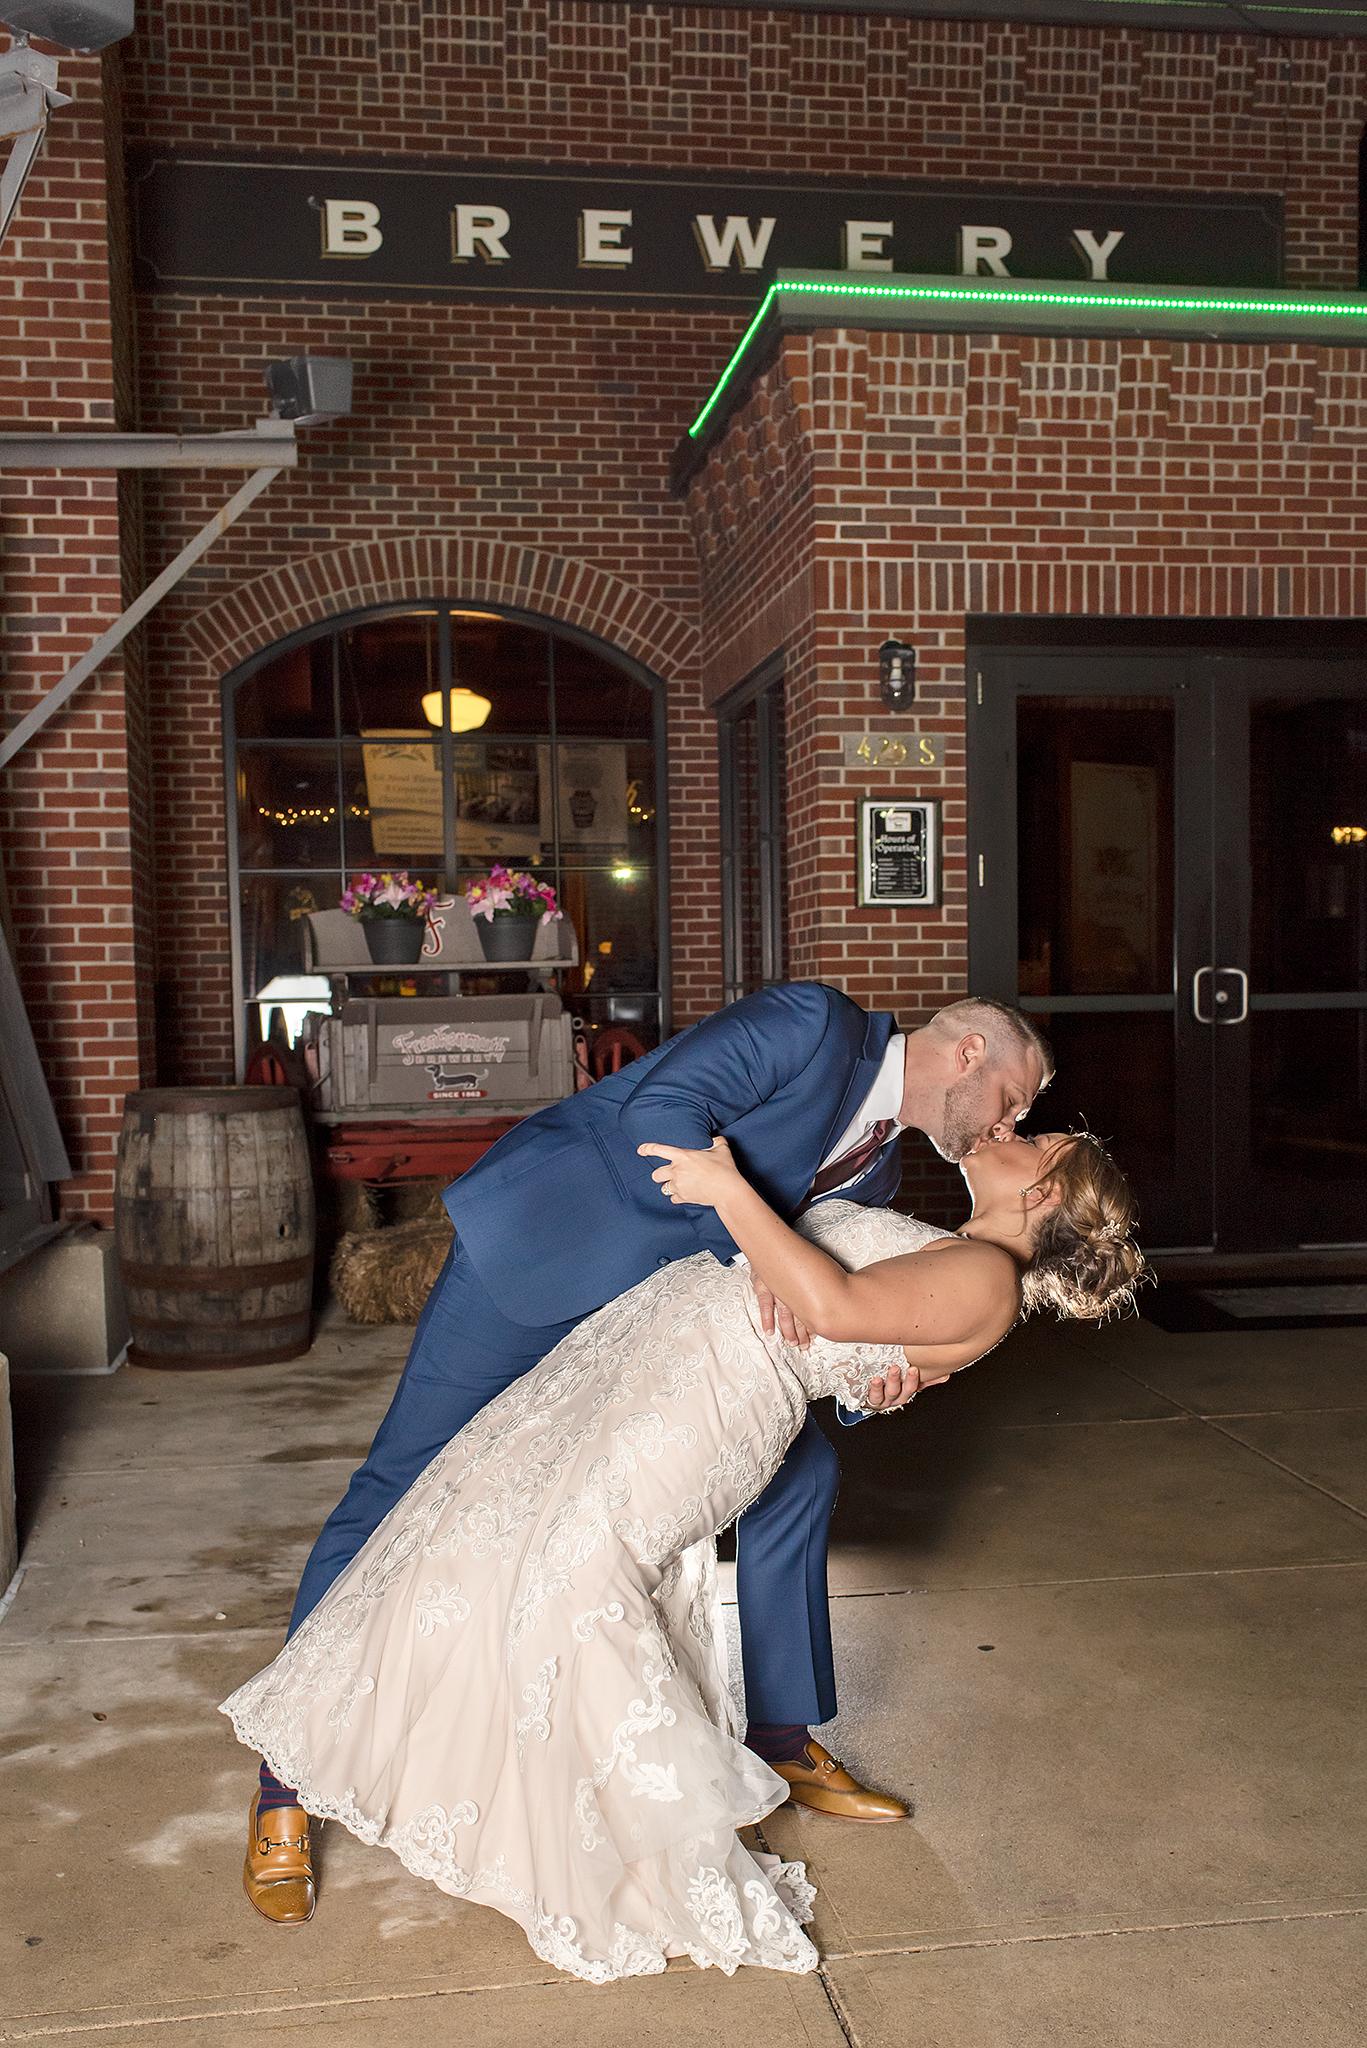 LINDSAY-ADKINS-PHOTOGRAPHY-MICHIGAN-WEDDING-PHOTOGRAPHER-FRANKENMUTH-BREWERY-WEDDING-MICHIGAN-BLOG-34